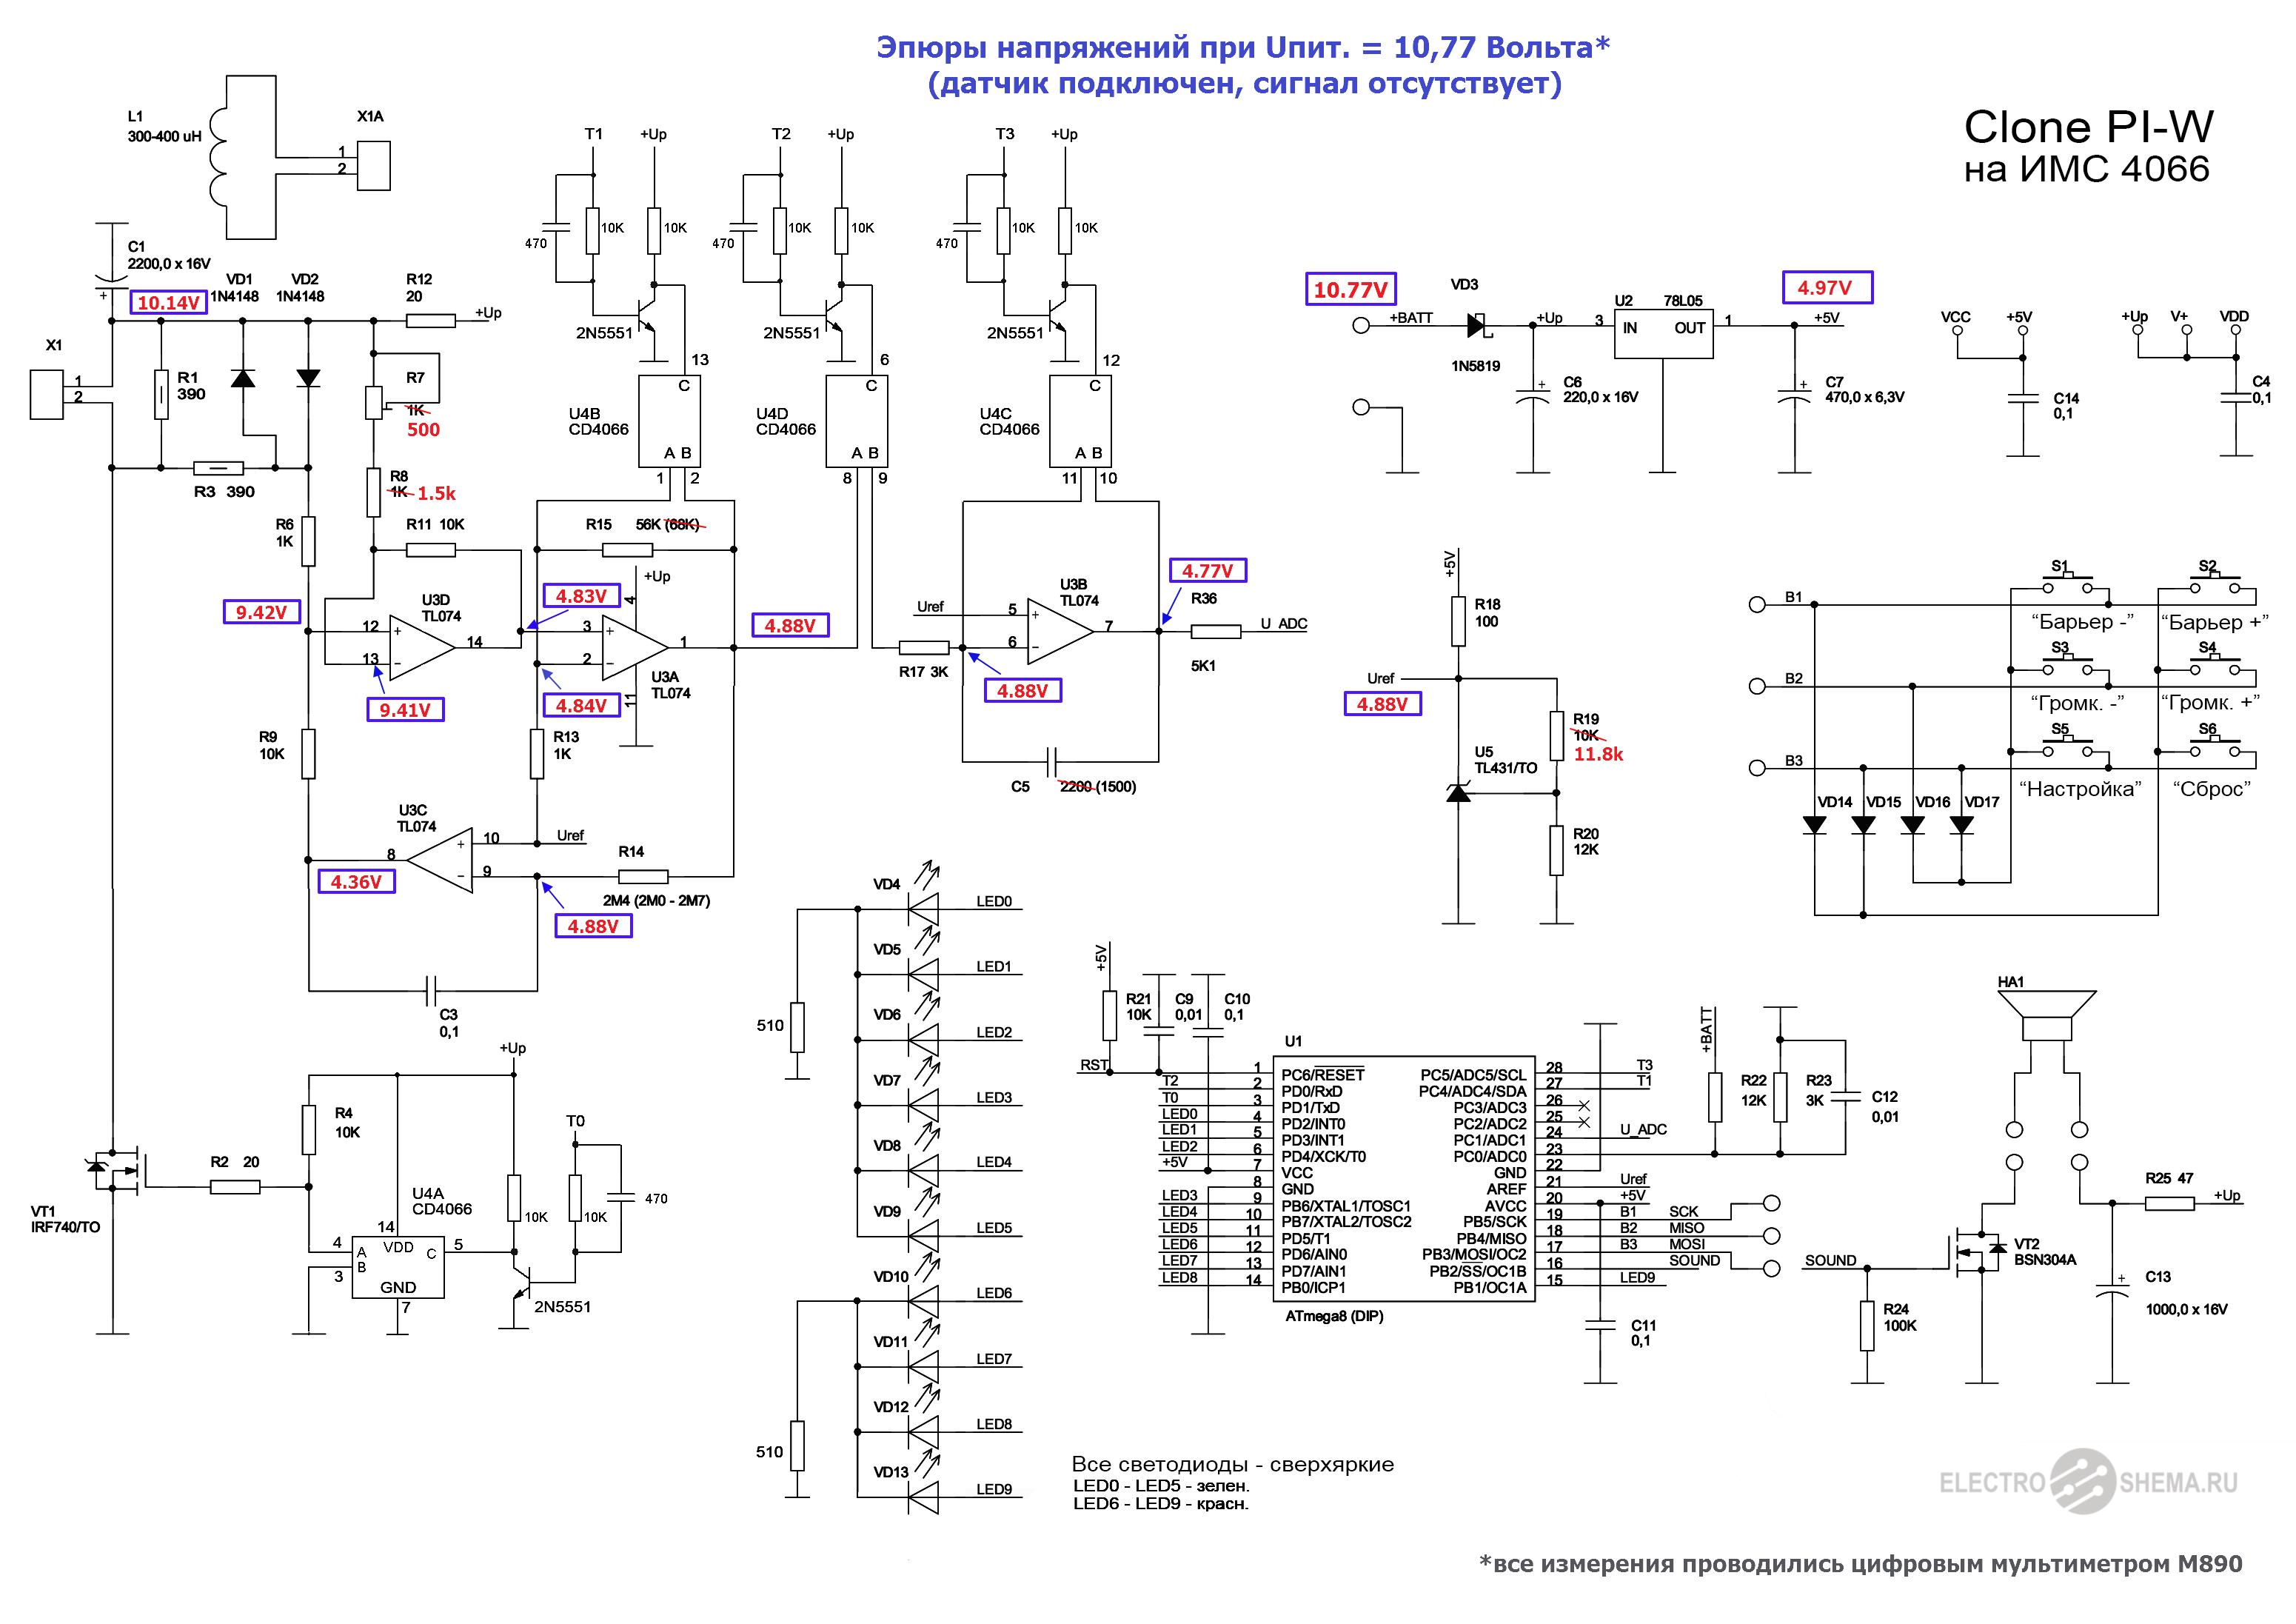 Диаграмма (эпюры) напряжений Clone PI-W